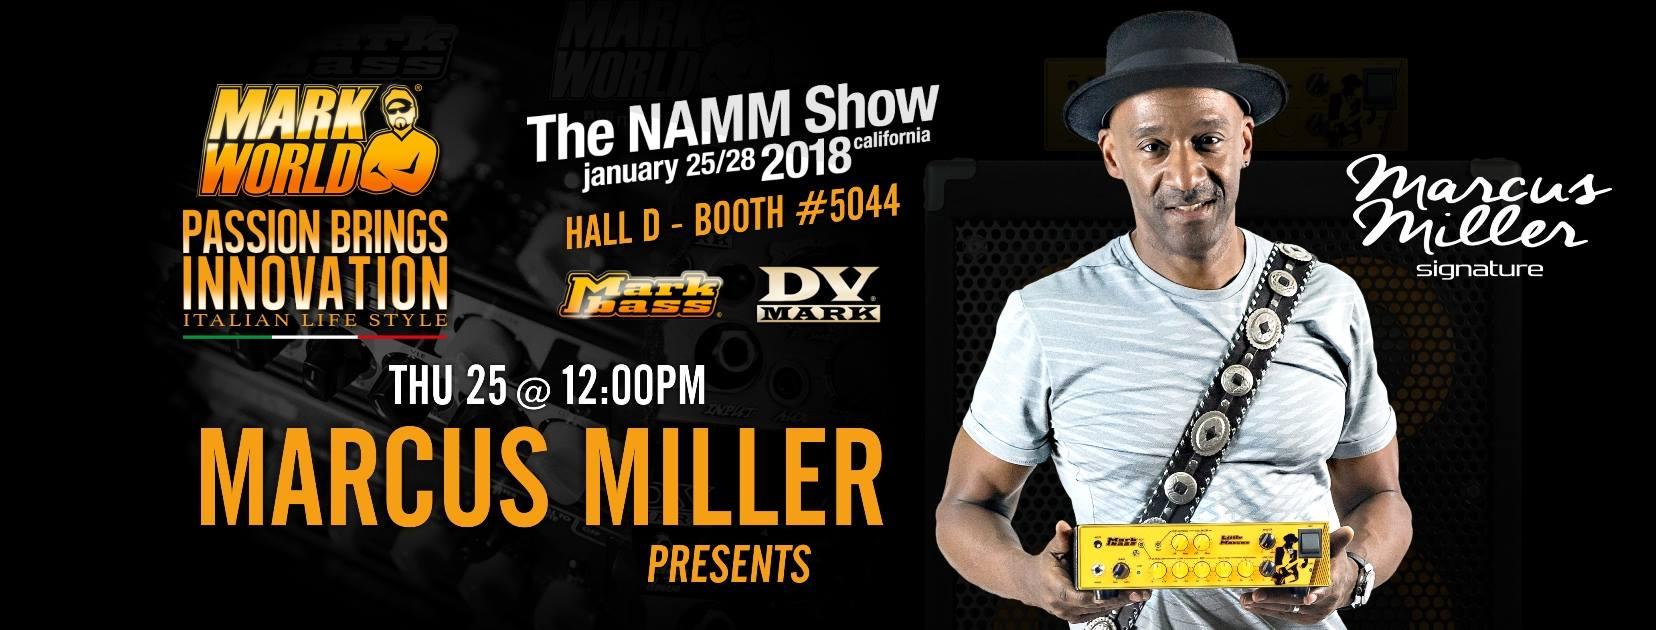 Marcu Miller show Namm 2018